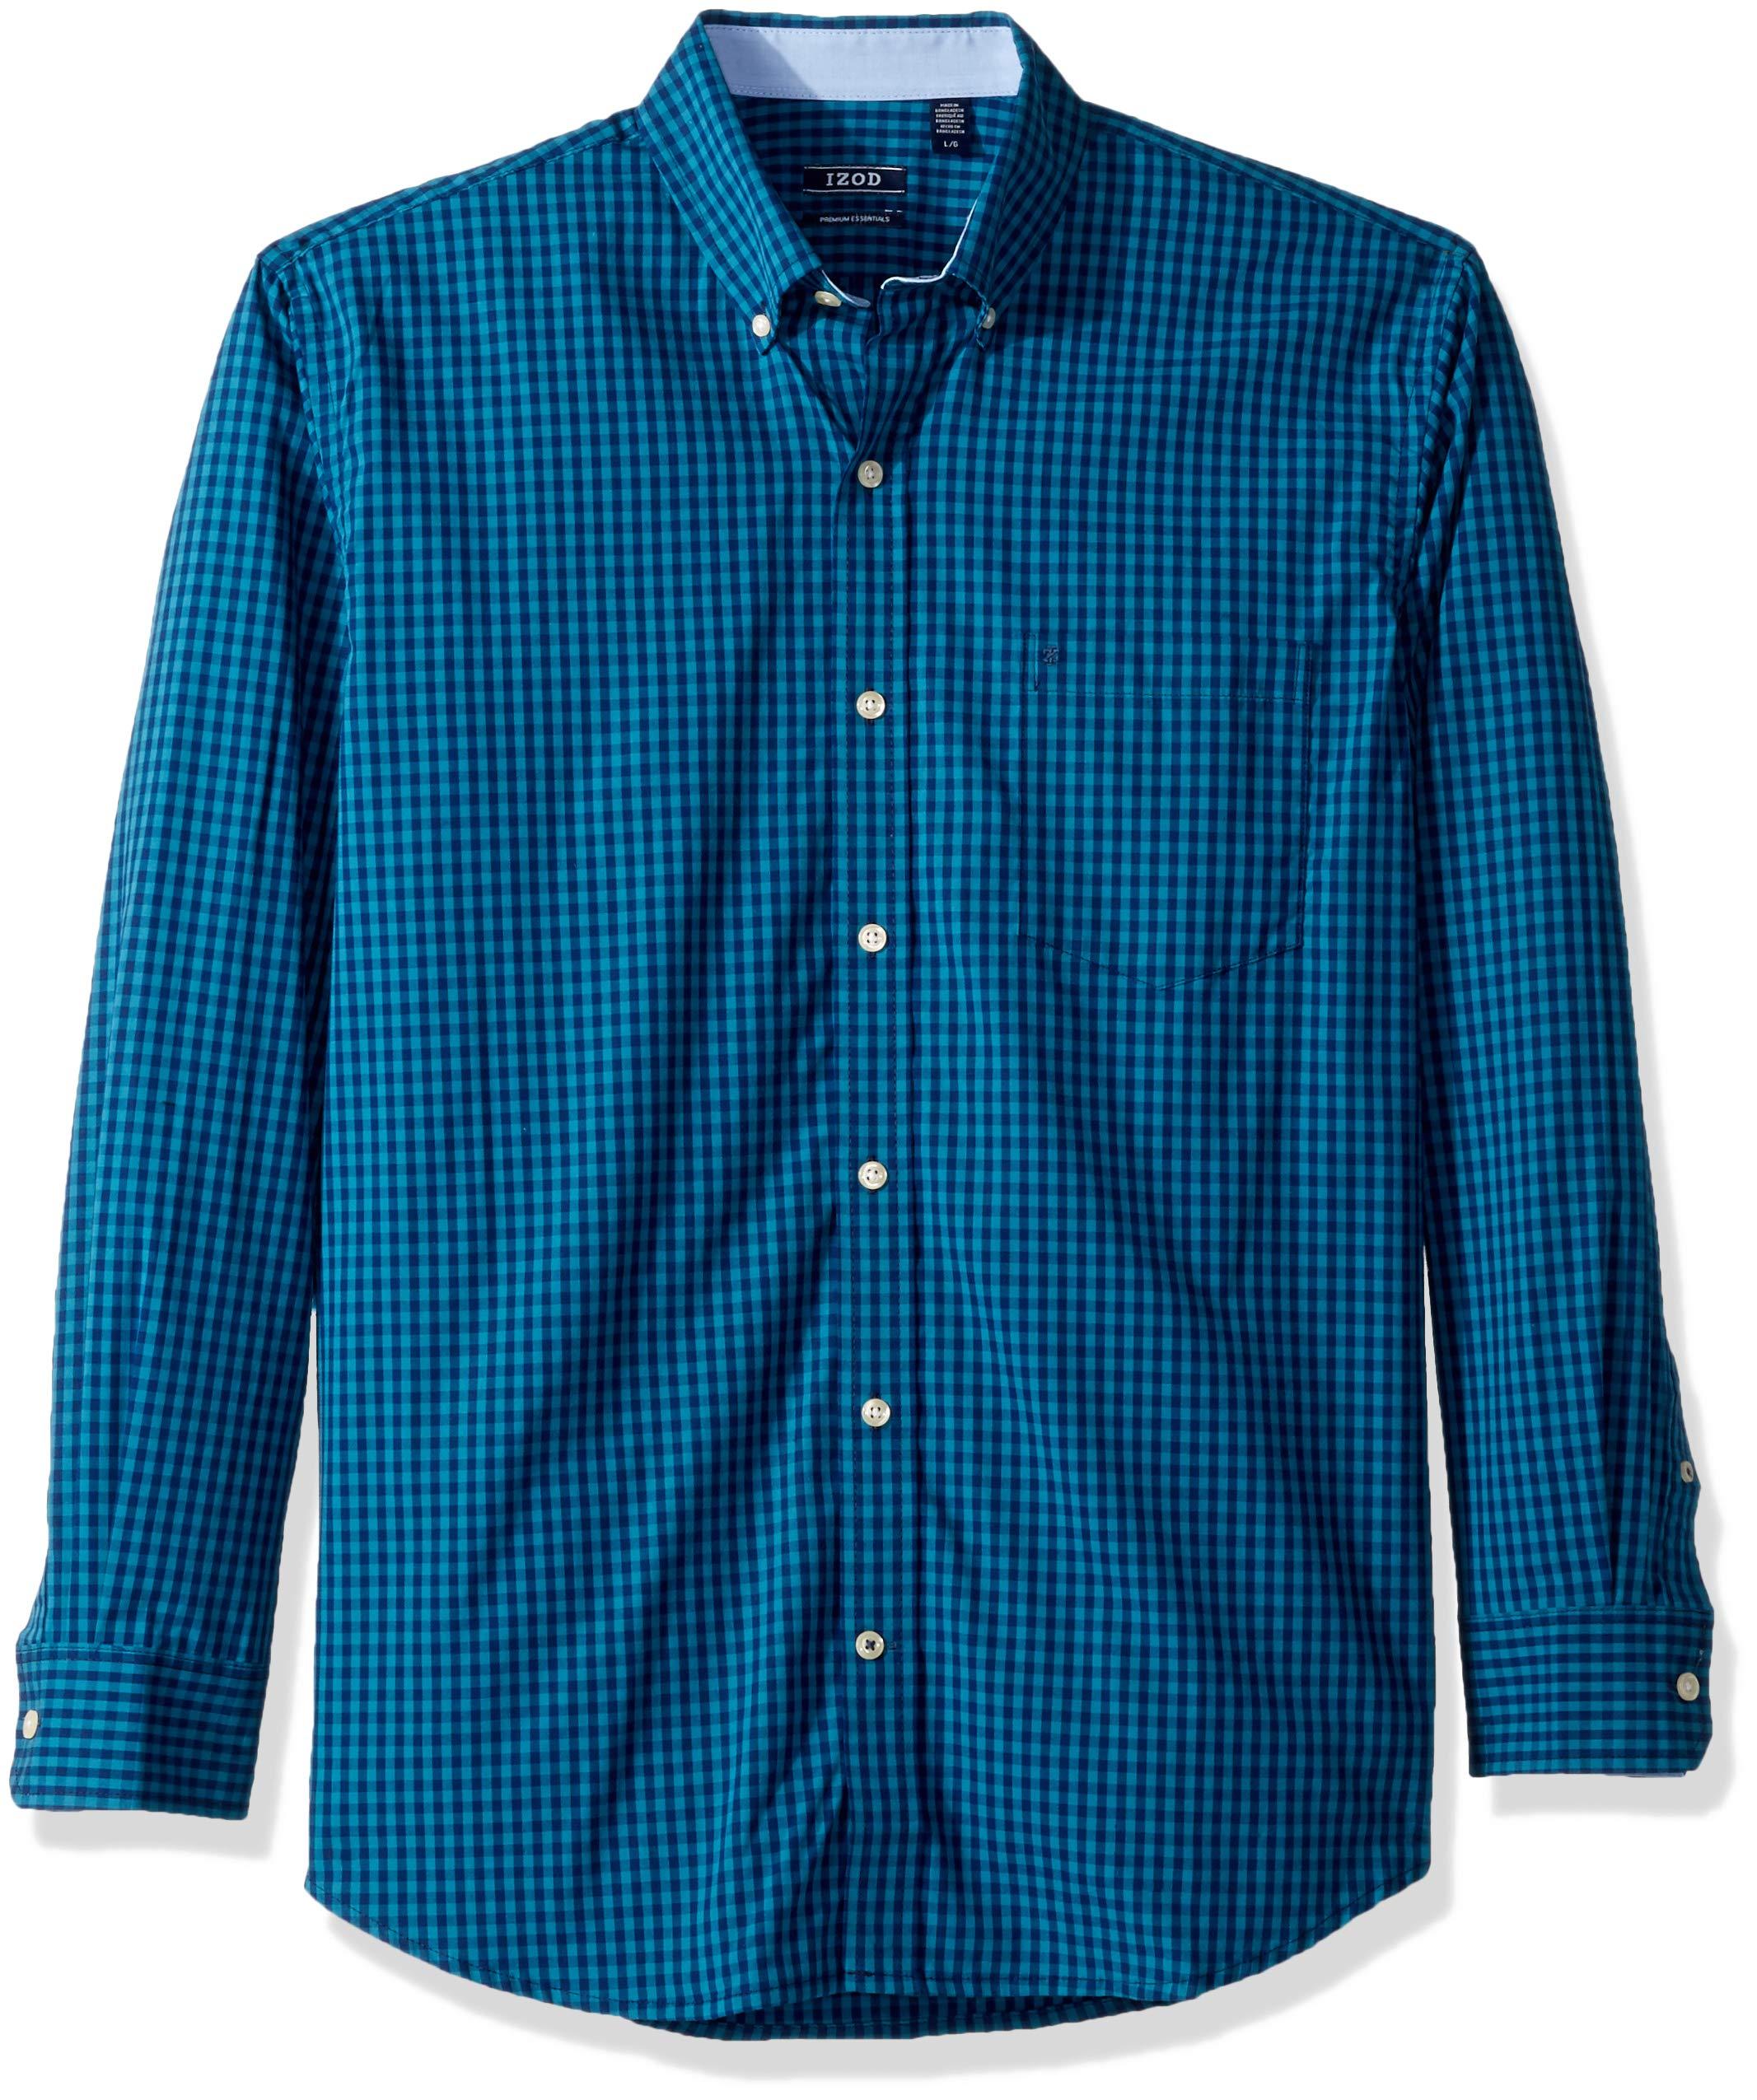 IZOD Men's Premium Essential Gingham Long Sleeve Shirt (Regular and Slim Fit), Saxony Blue, Large